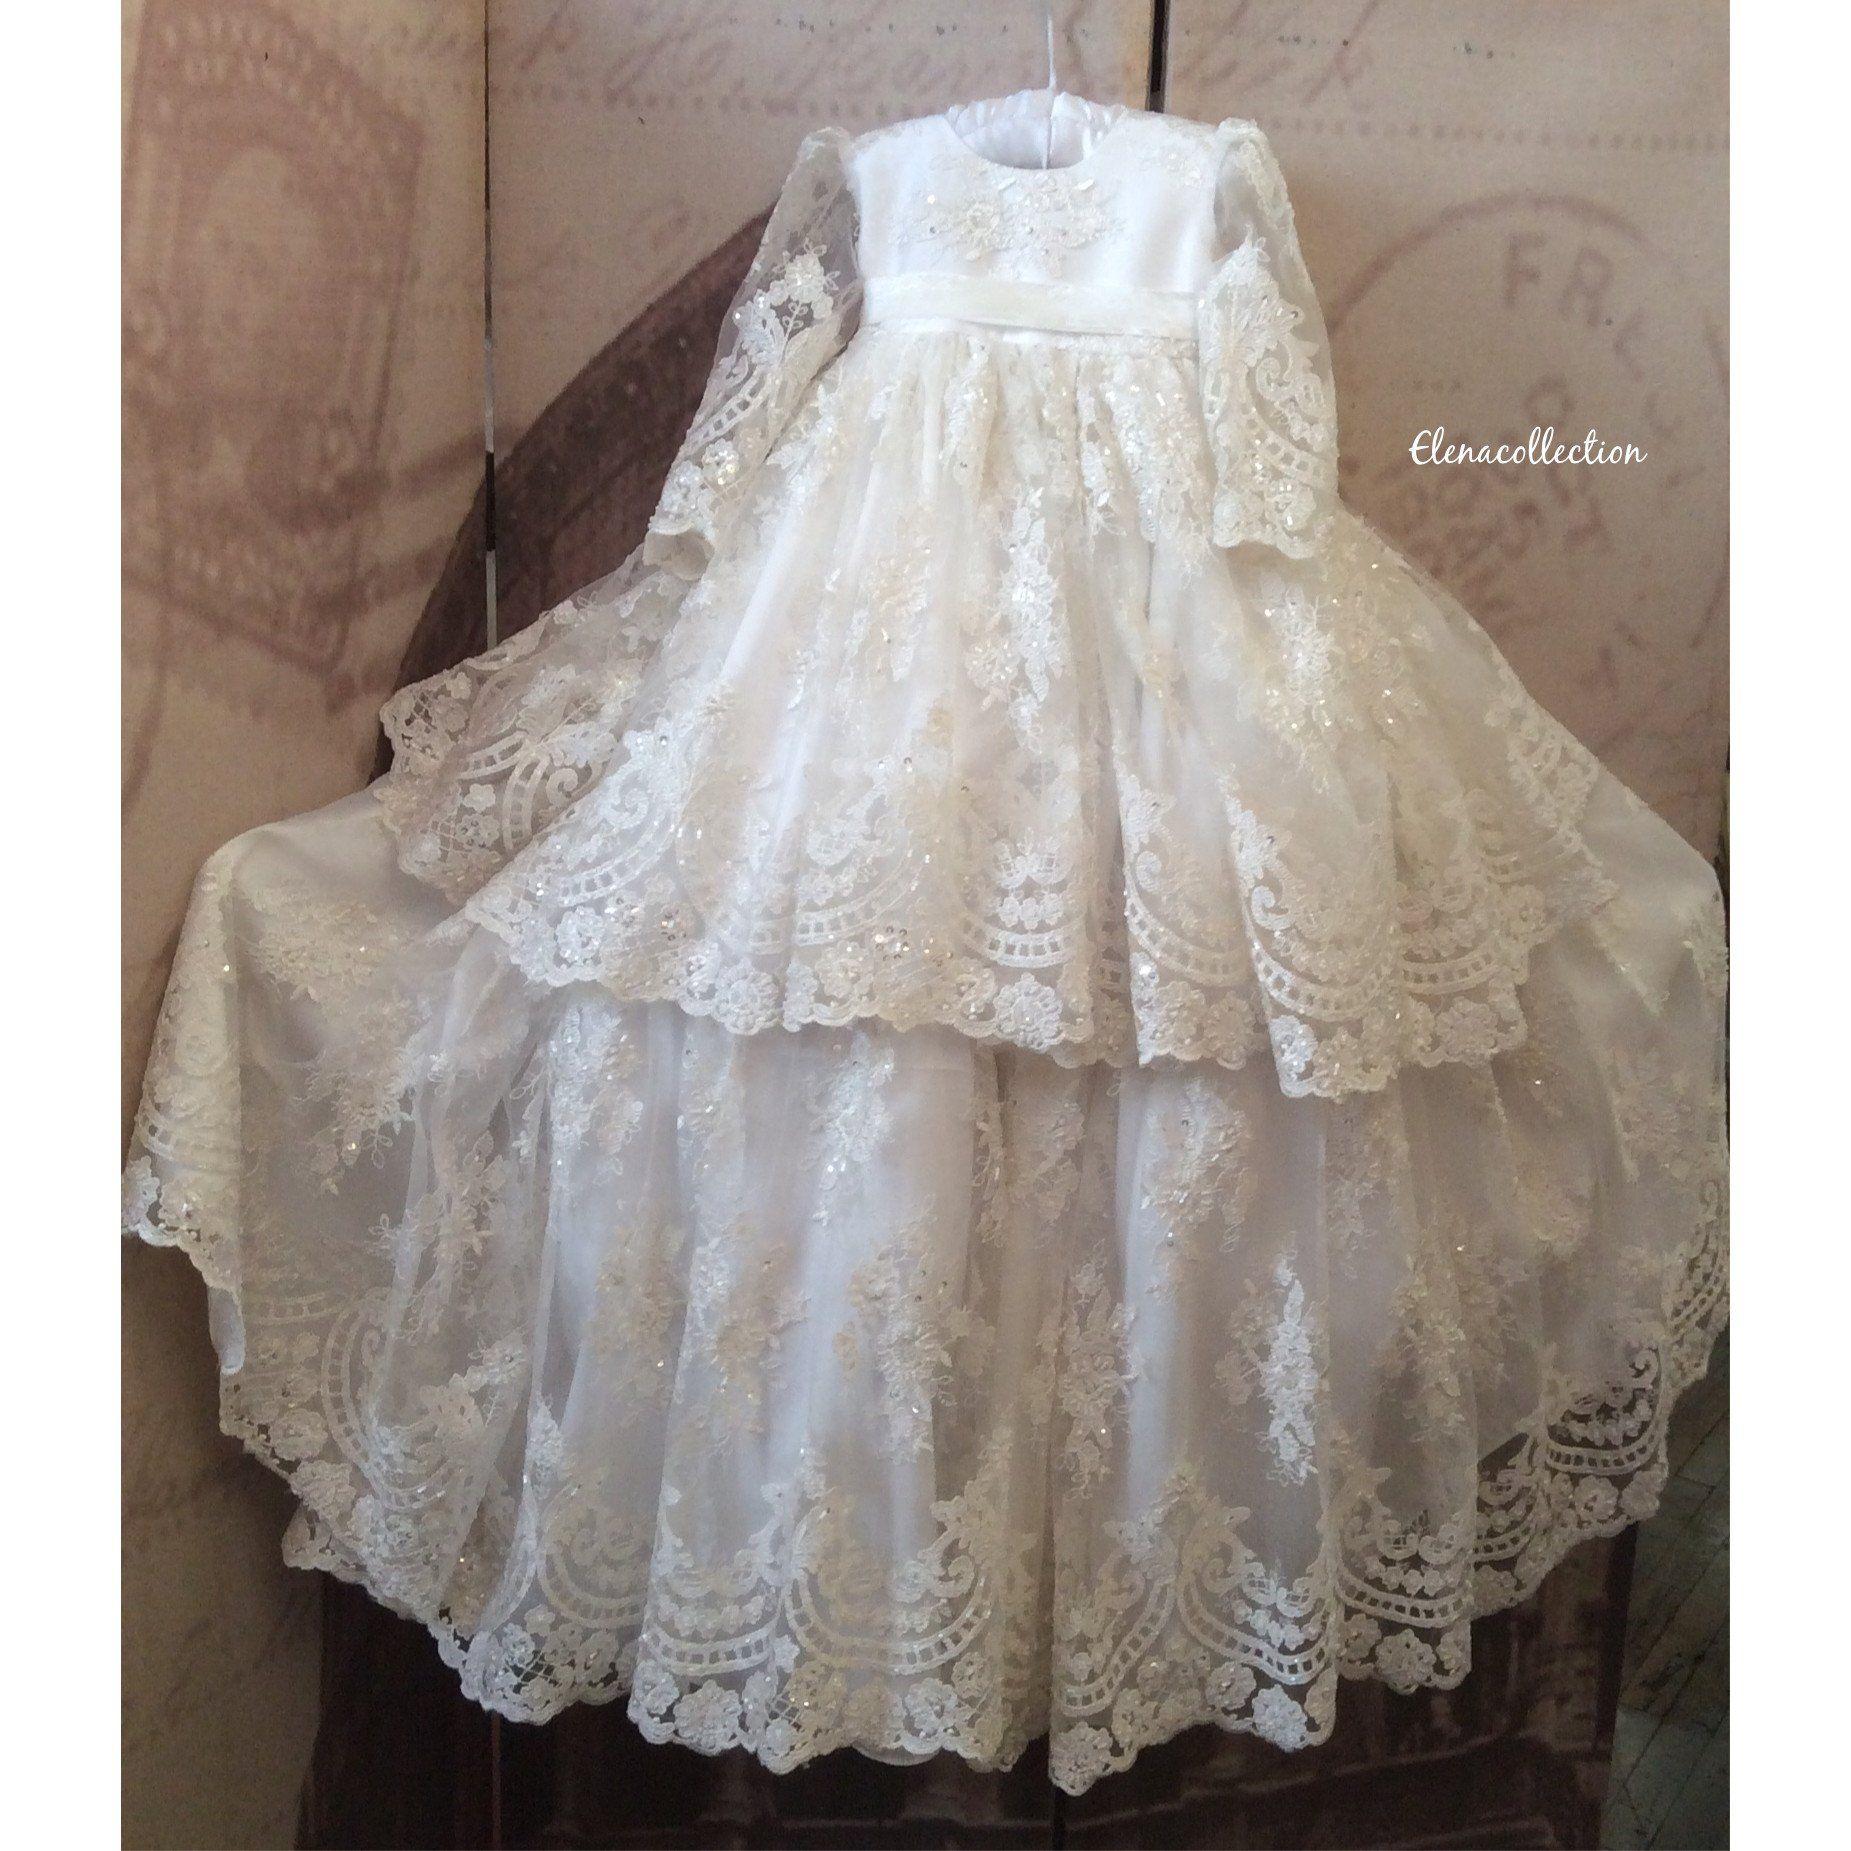 Aorme Christening Dresses With Bonnet Long Lace Baptism Gowns